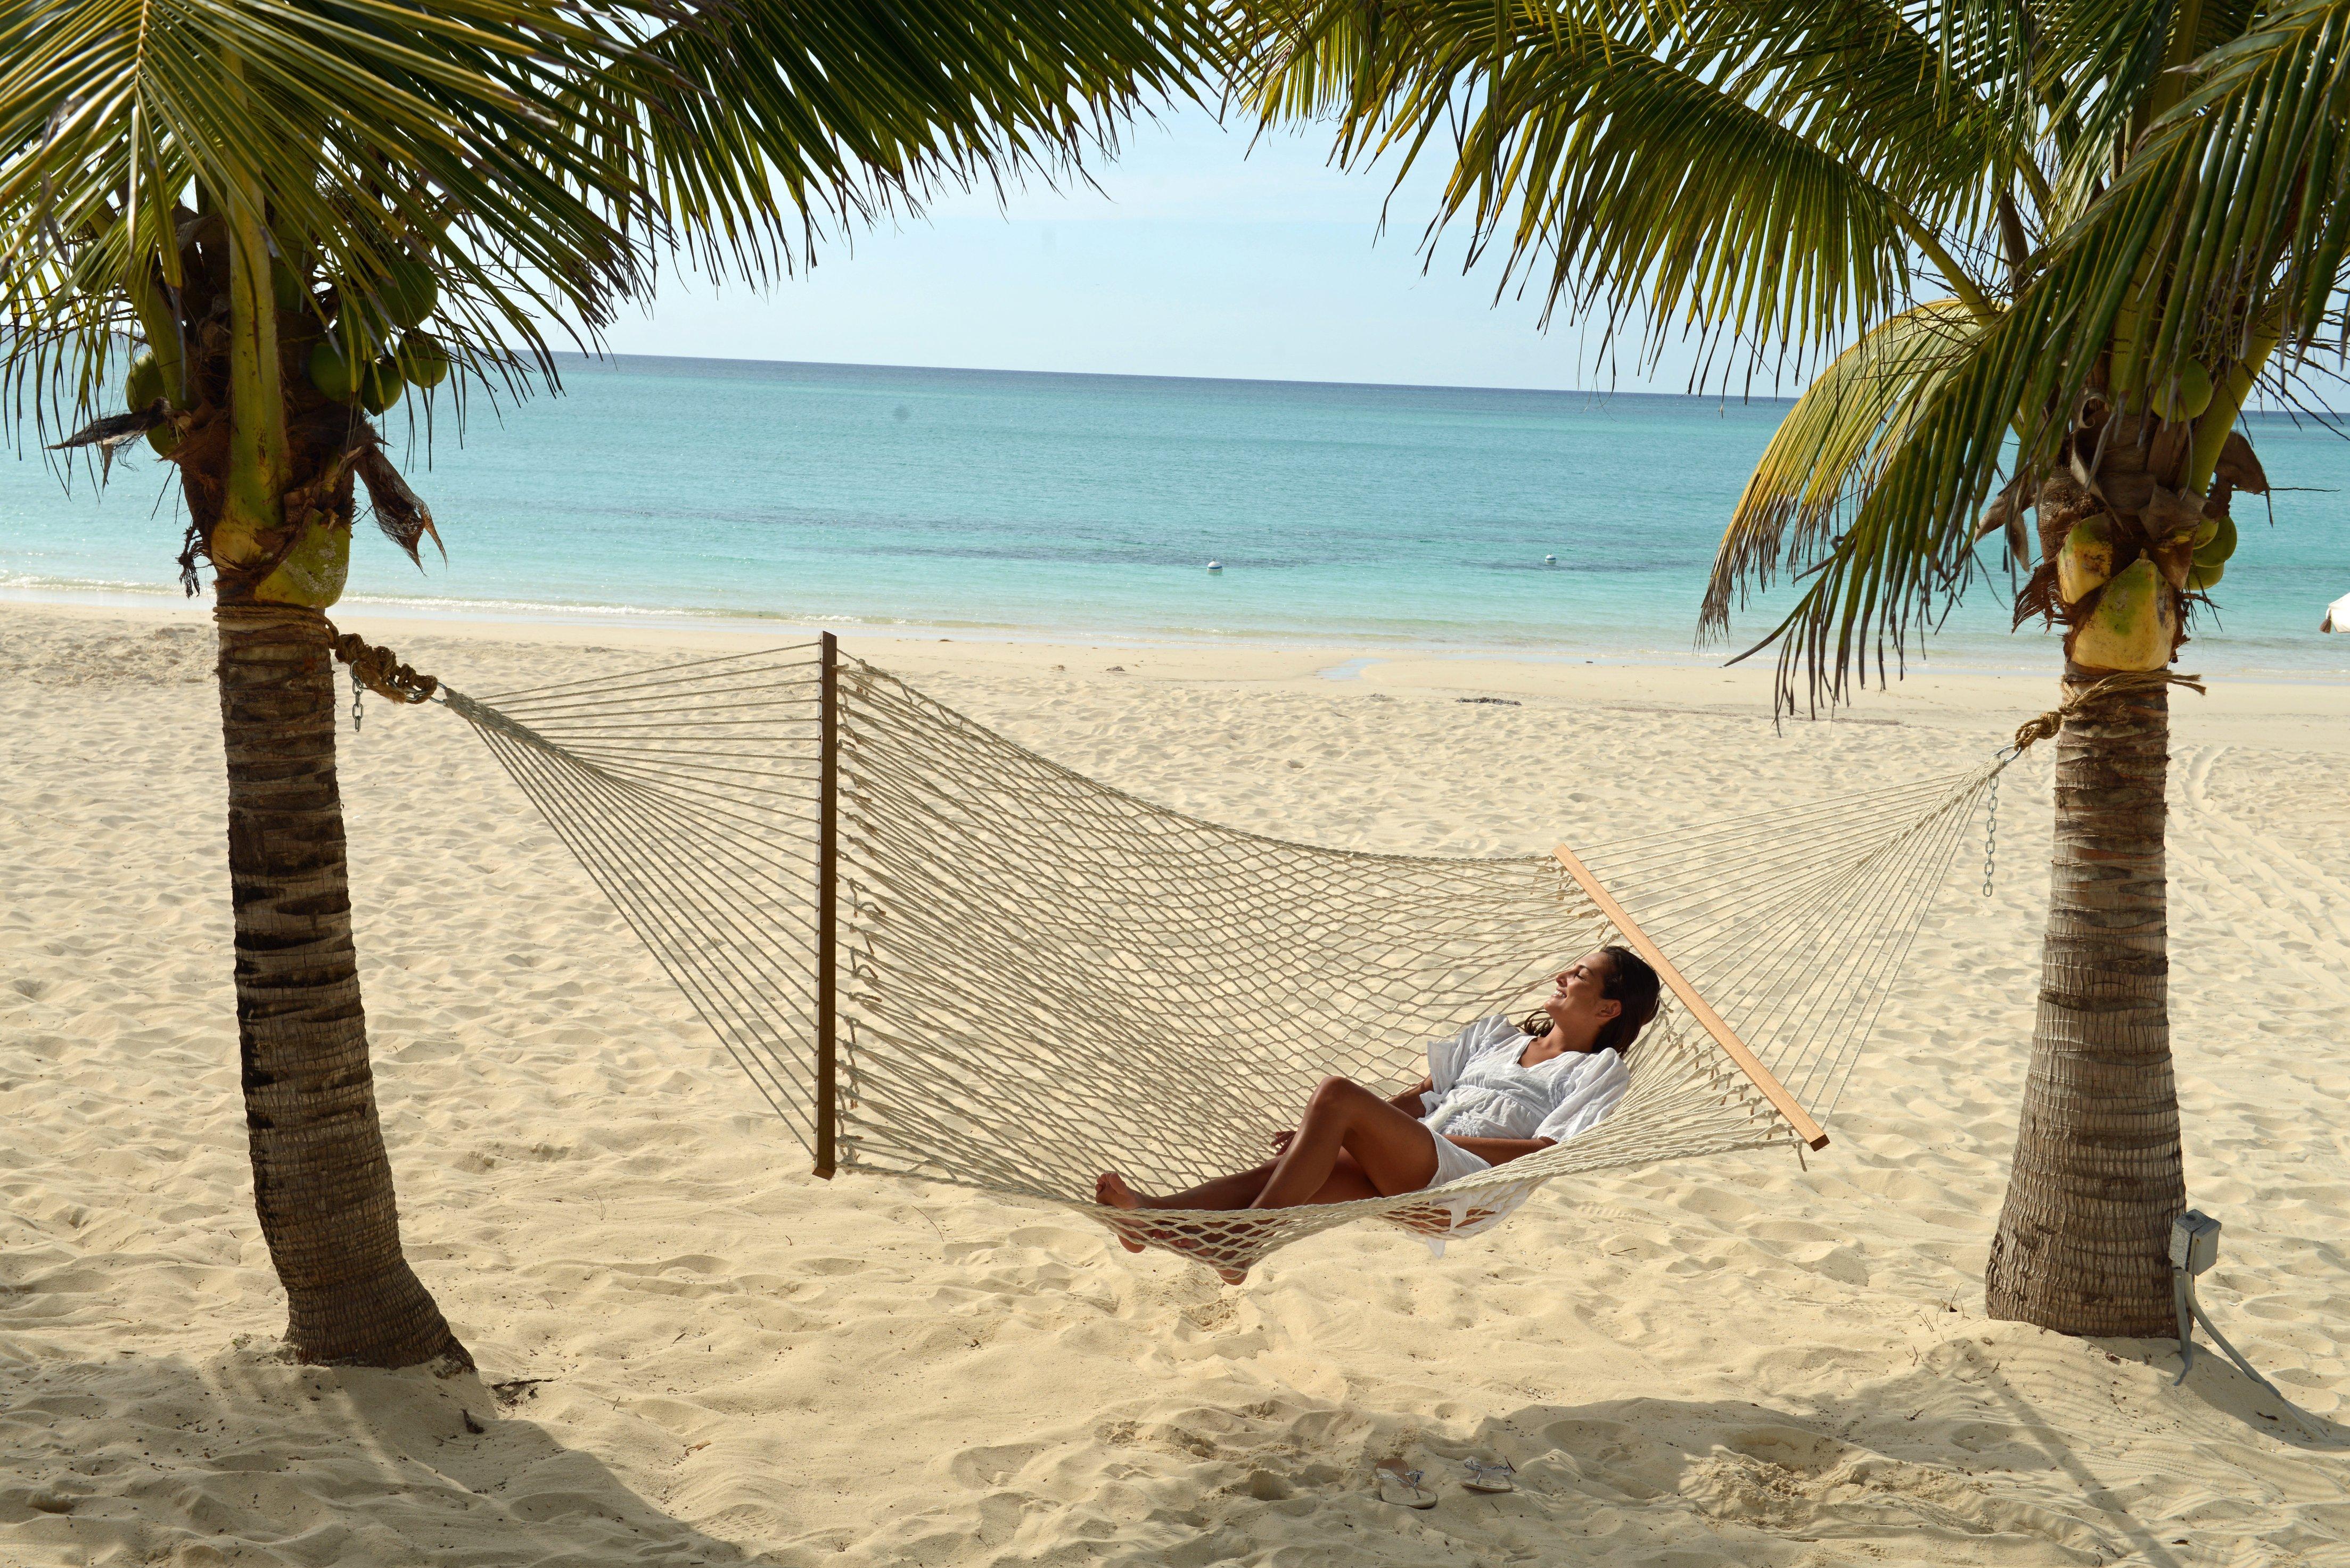 Worlds best beaches Top 100 ranked CNN Travel 4414x2946